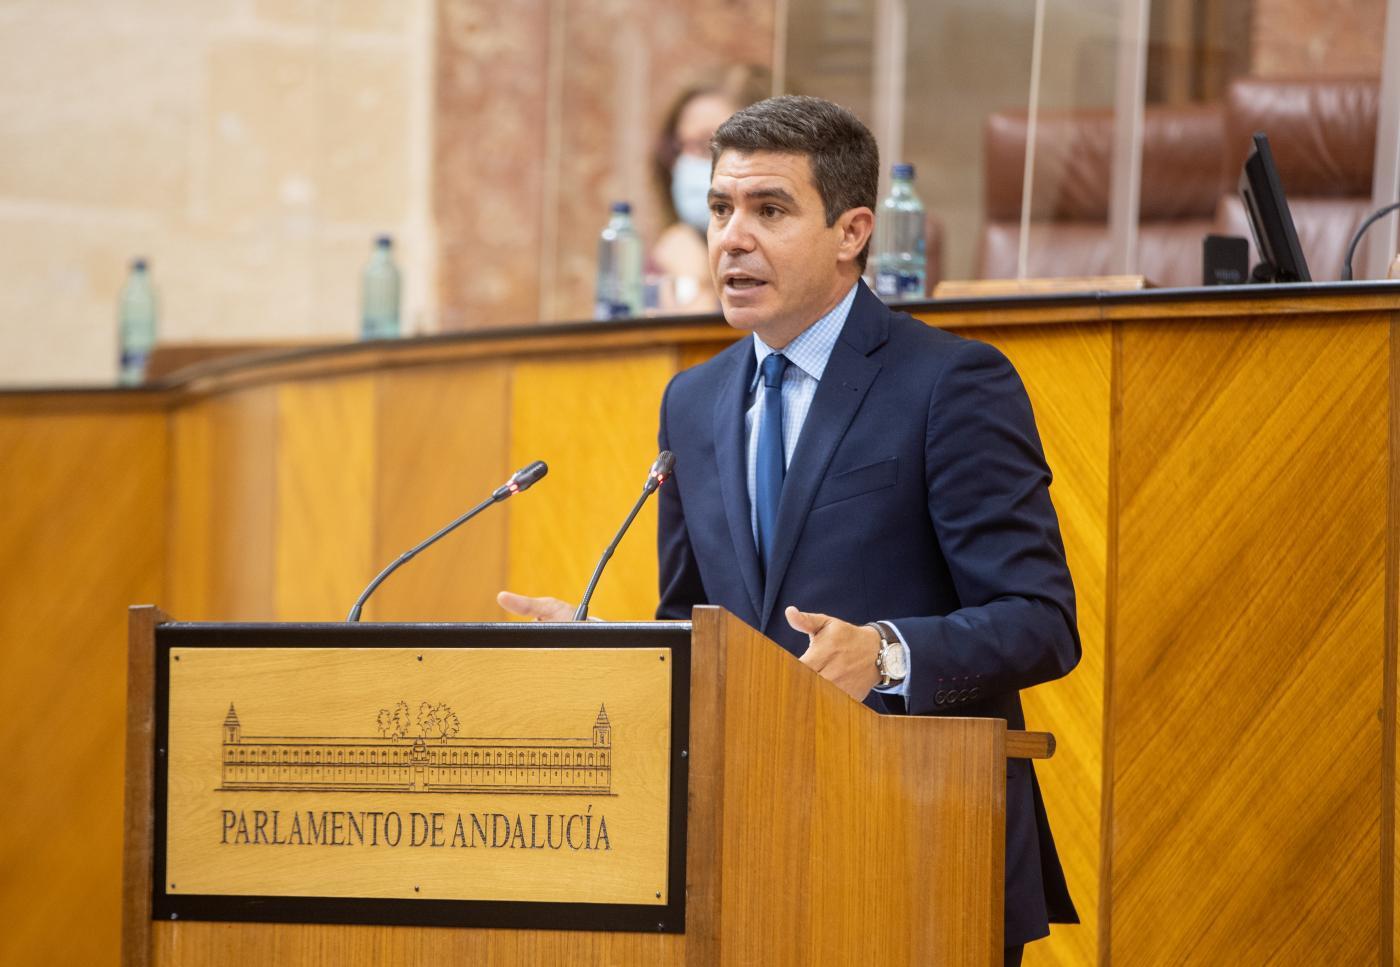 SergioRomero, del Parlamento andaluz a entrenador de fútbol